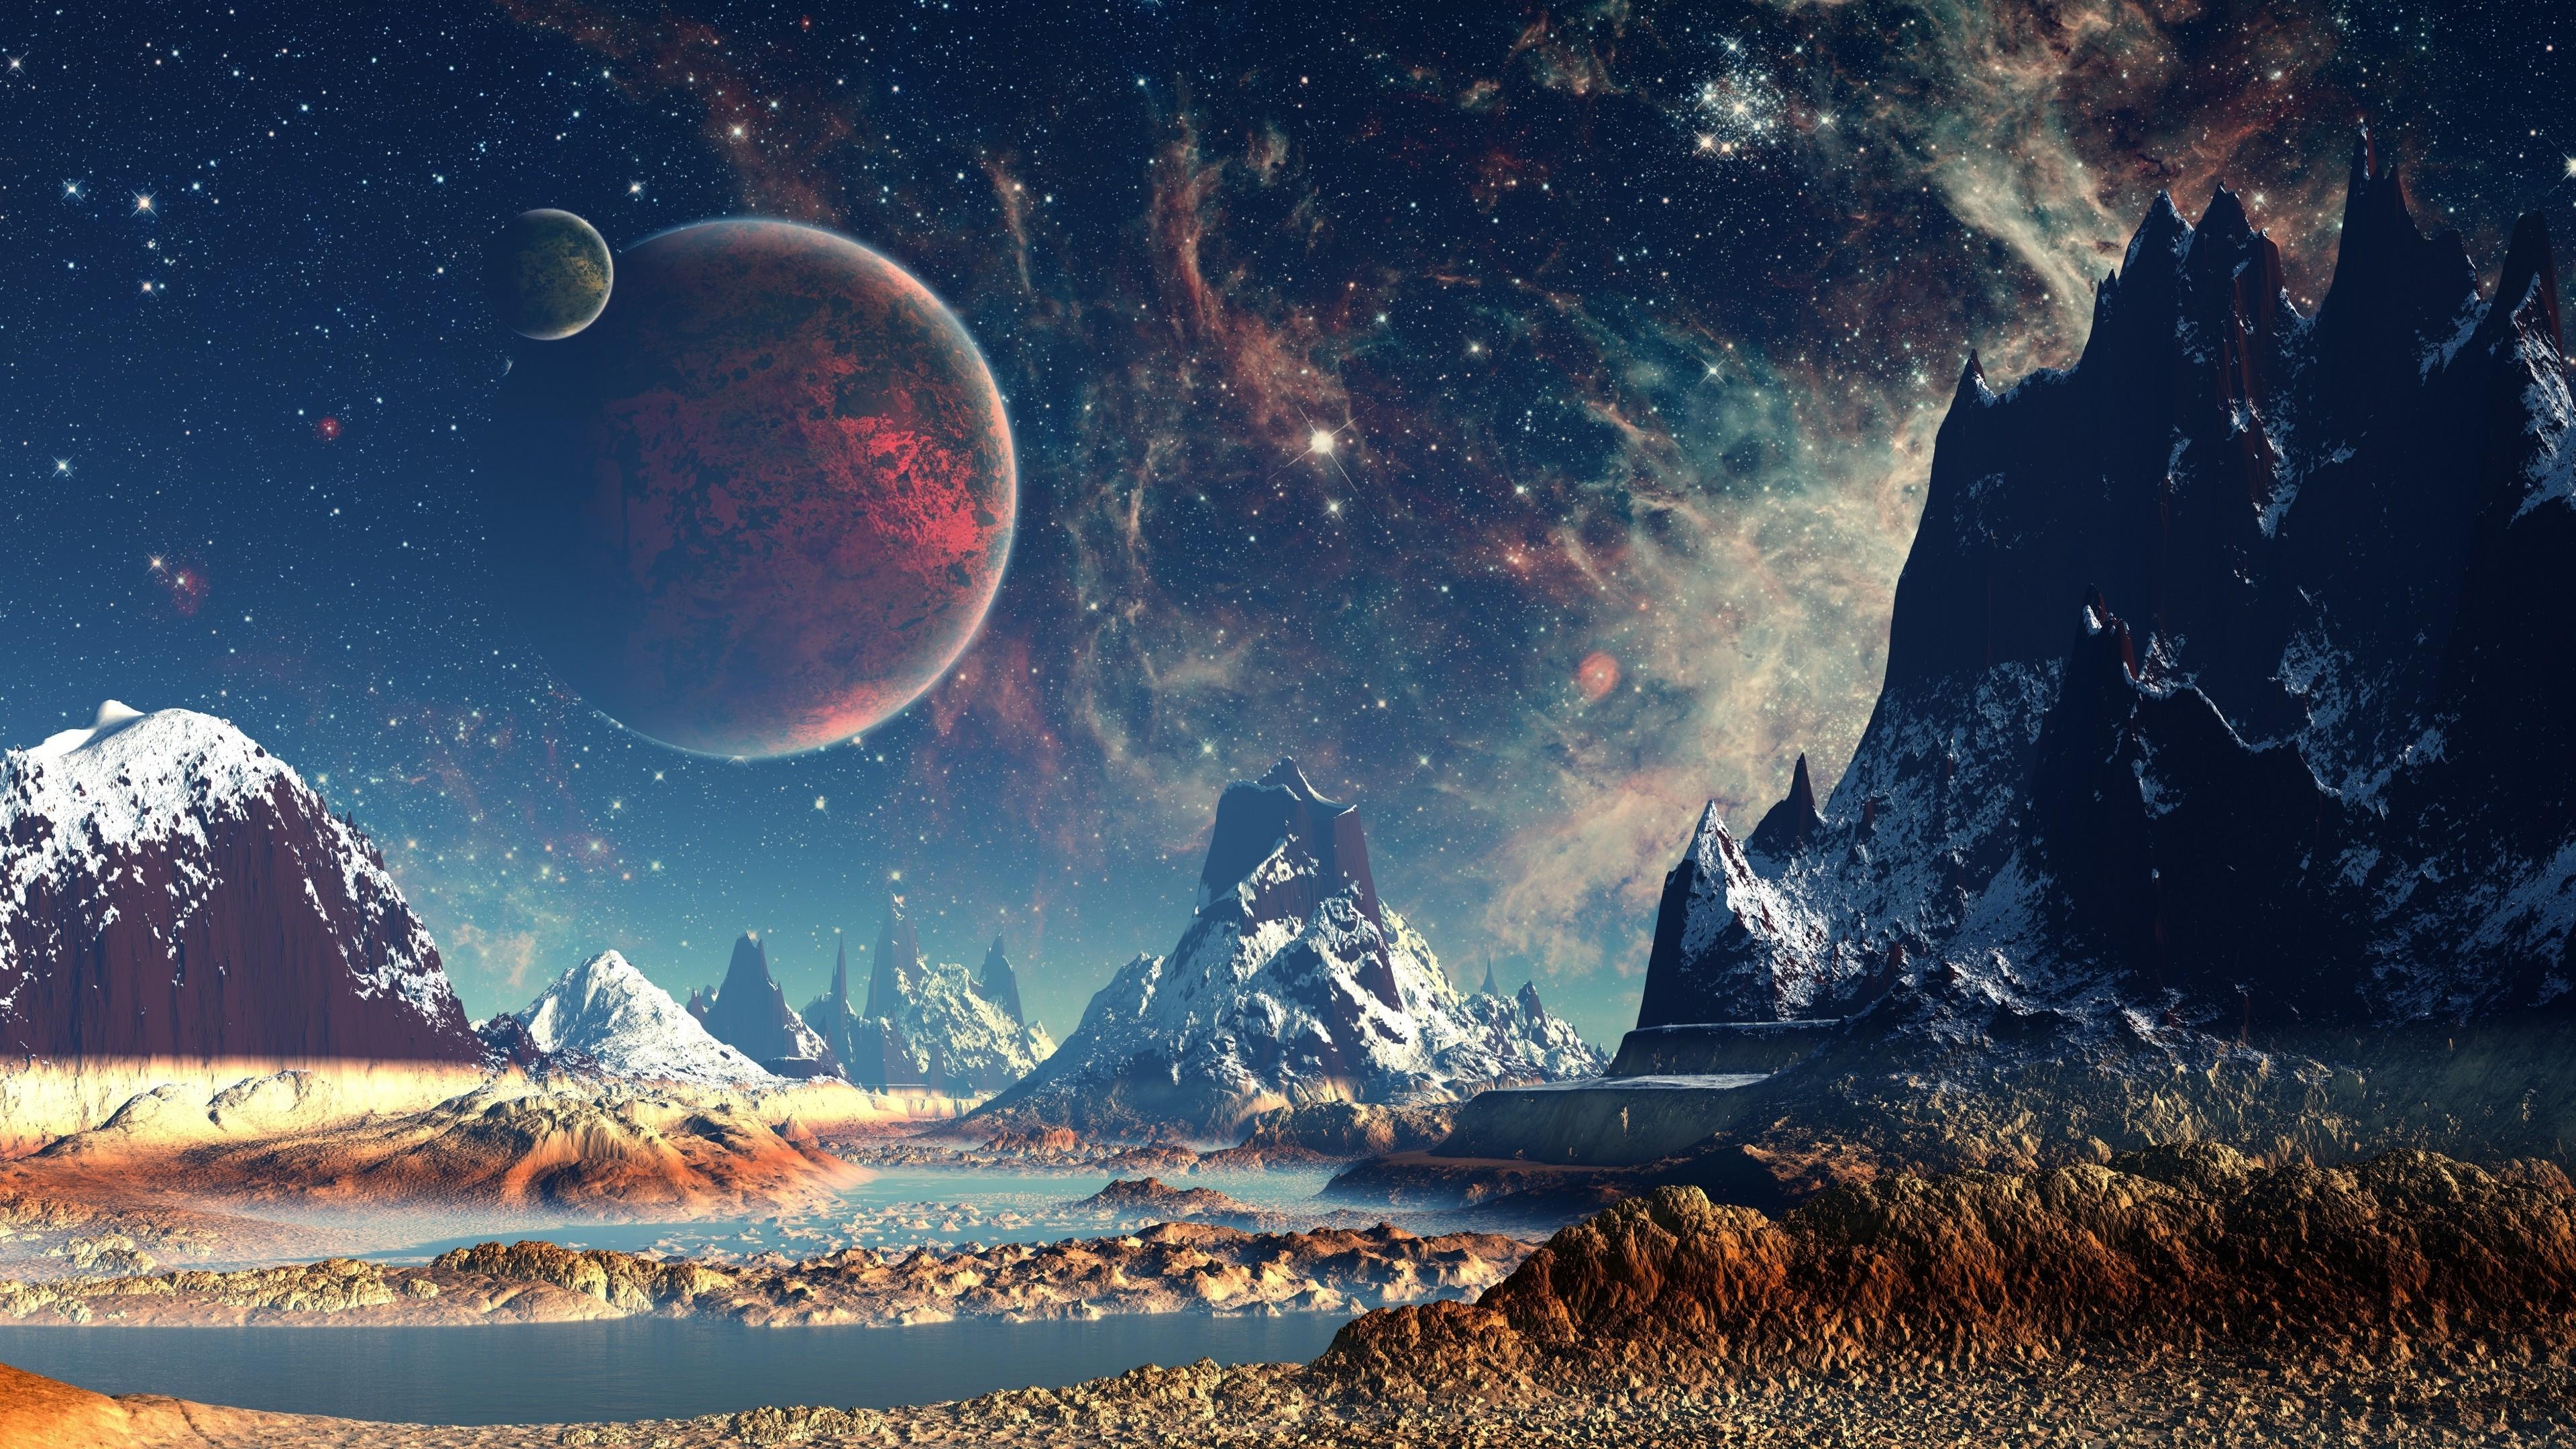 Cosmic Girls Wallpaper Stars Planet Space Mountain Digital Art Artwork